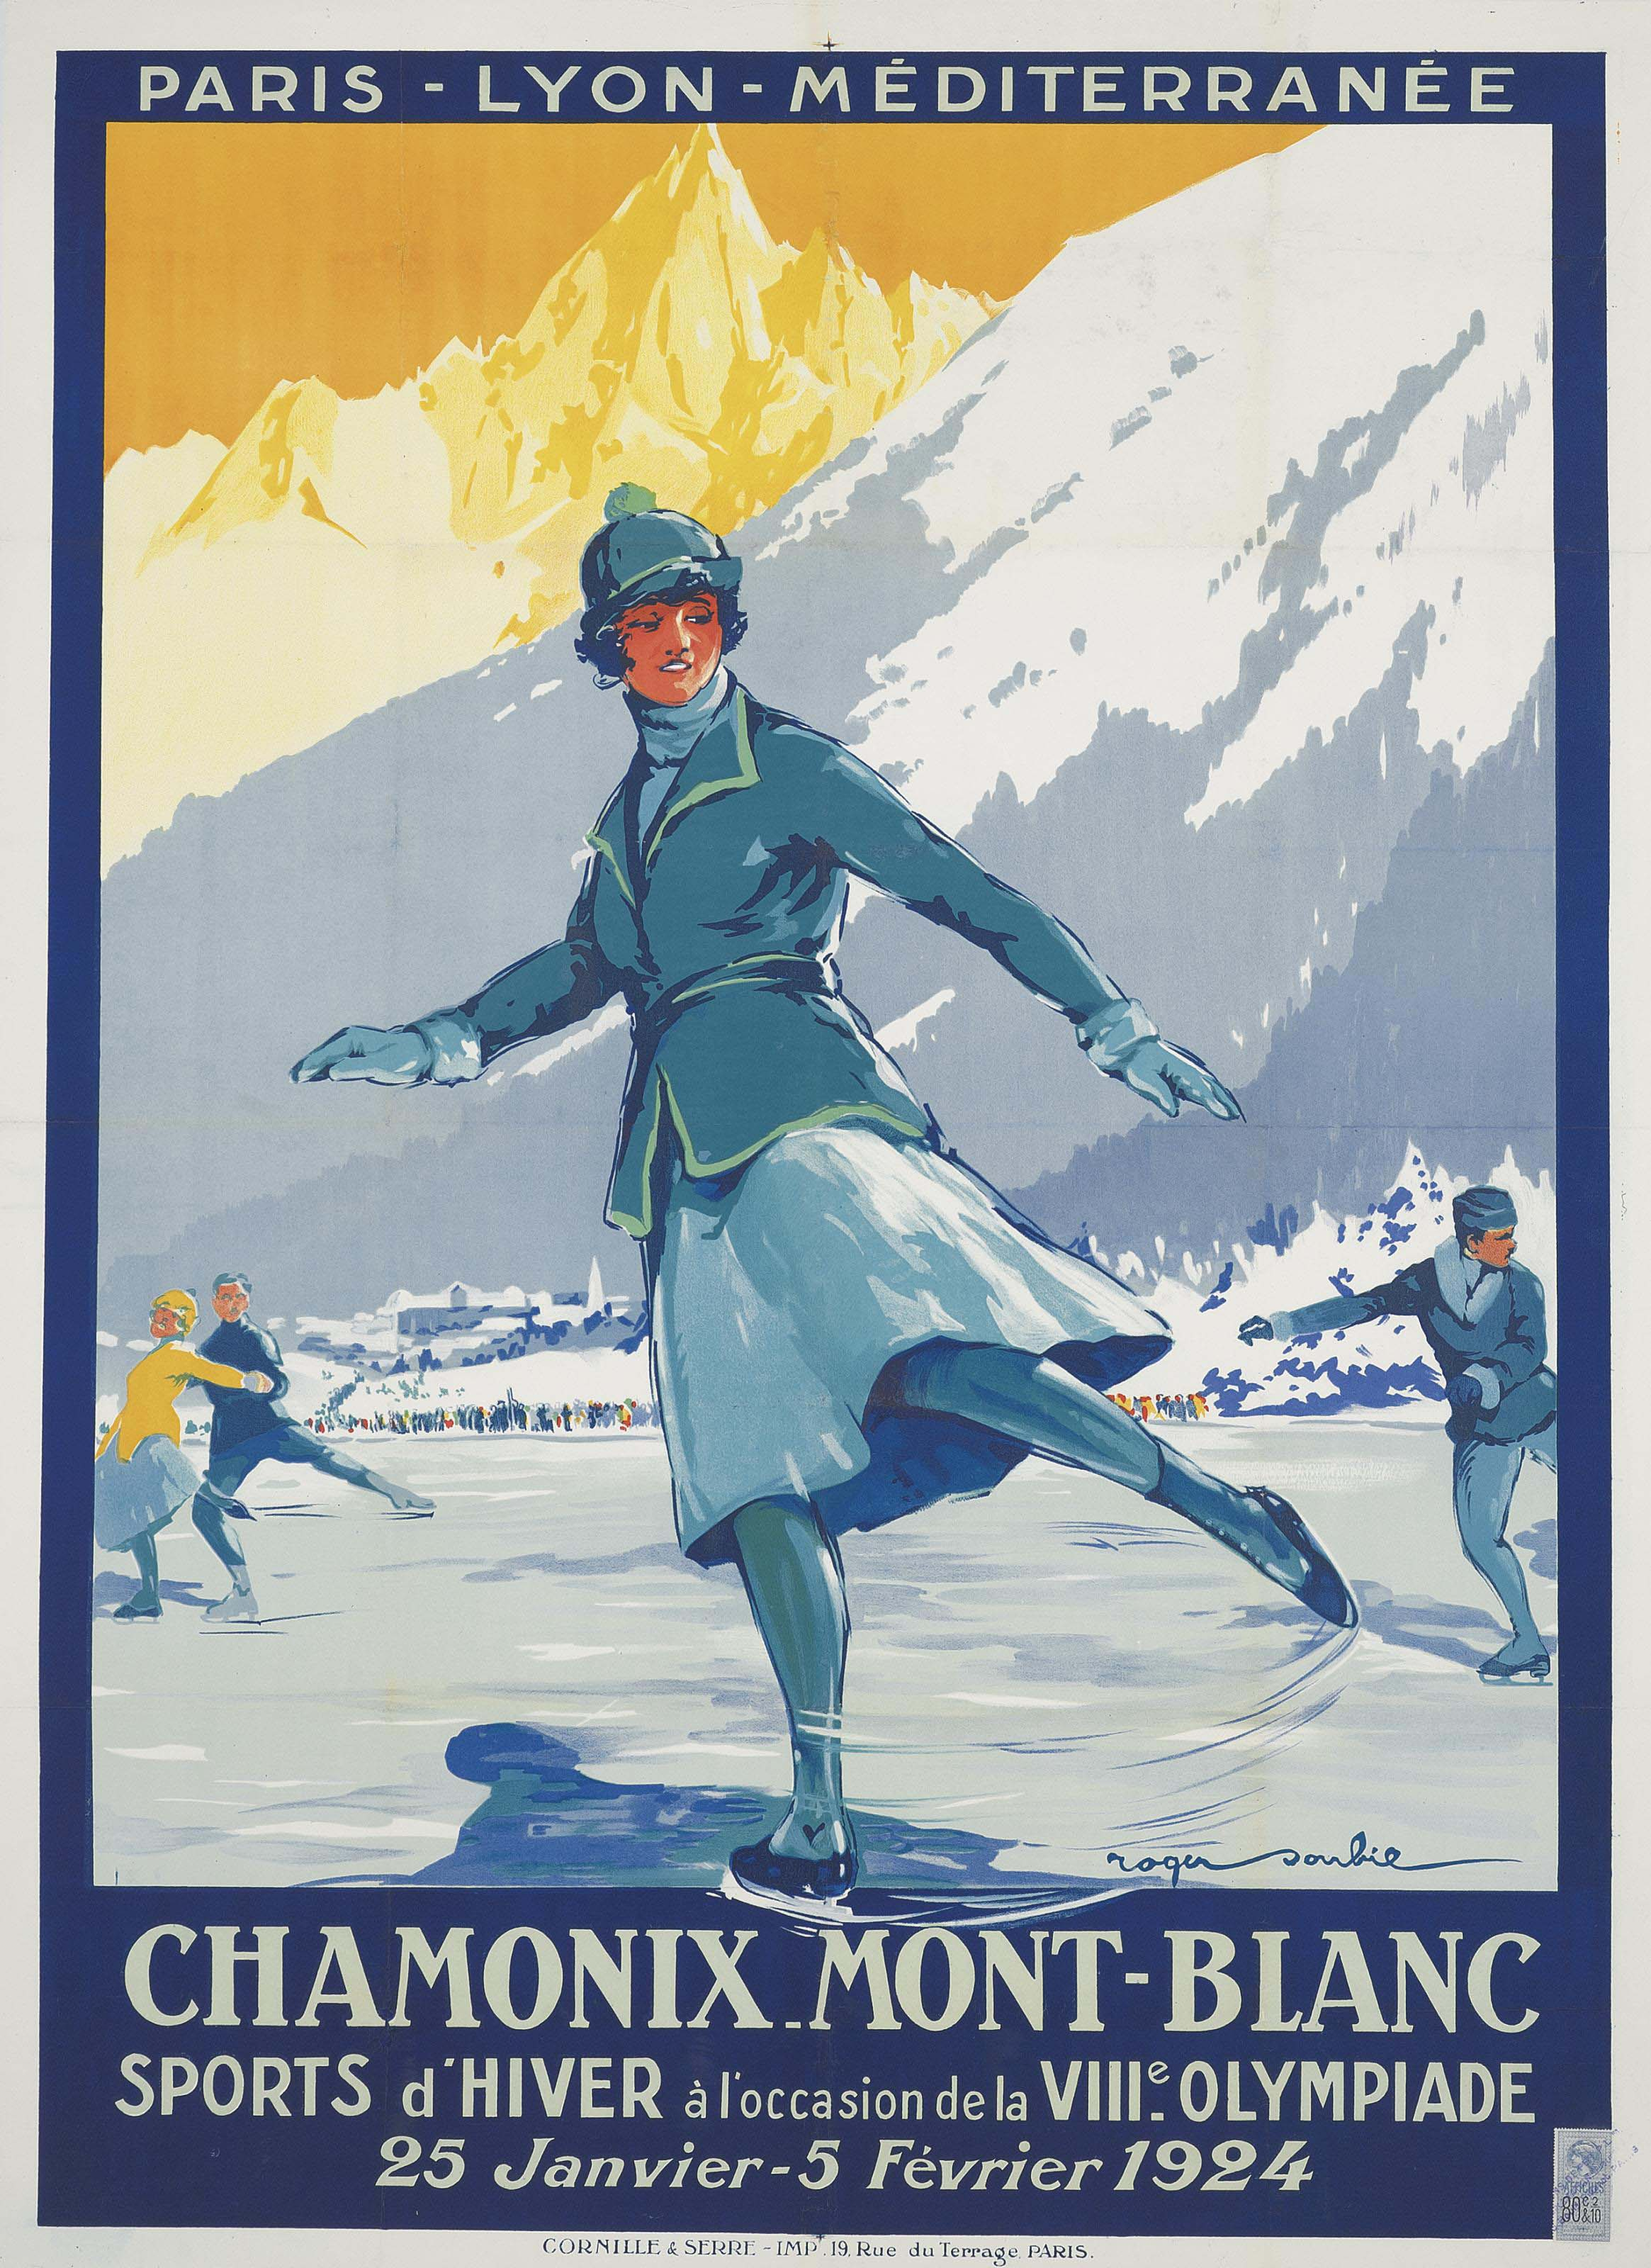 CHAMONIX MONT-BLANC, VIIIe OLYMPIADE 1924